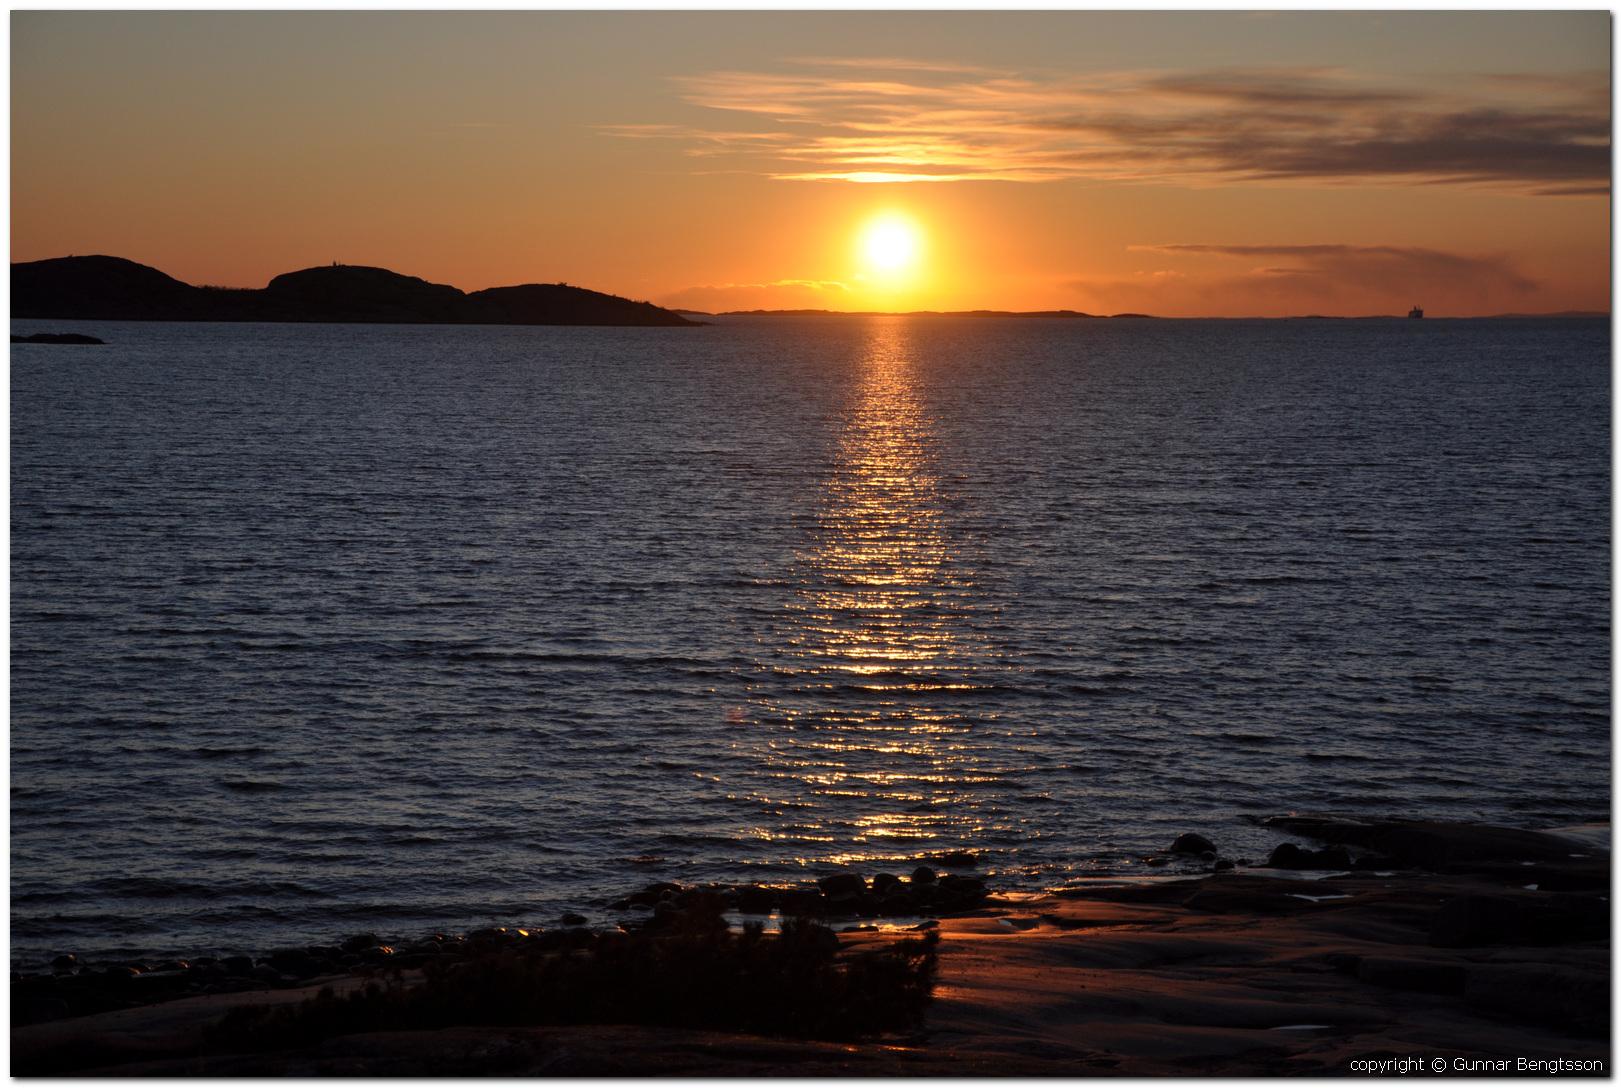 sunset_2012-04-03_dsc_3796